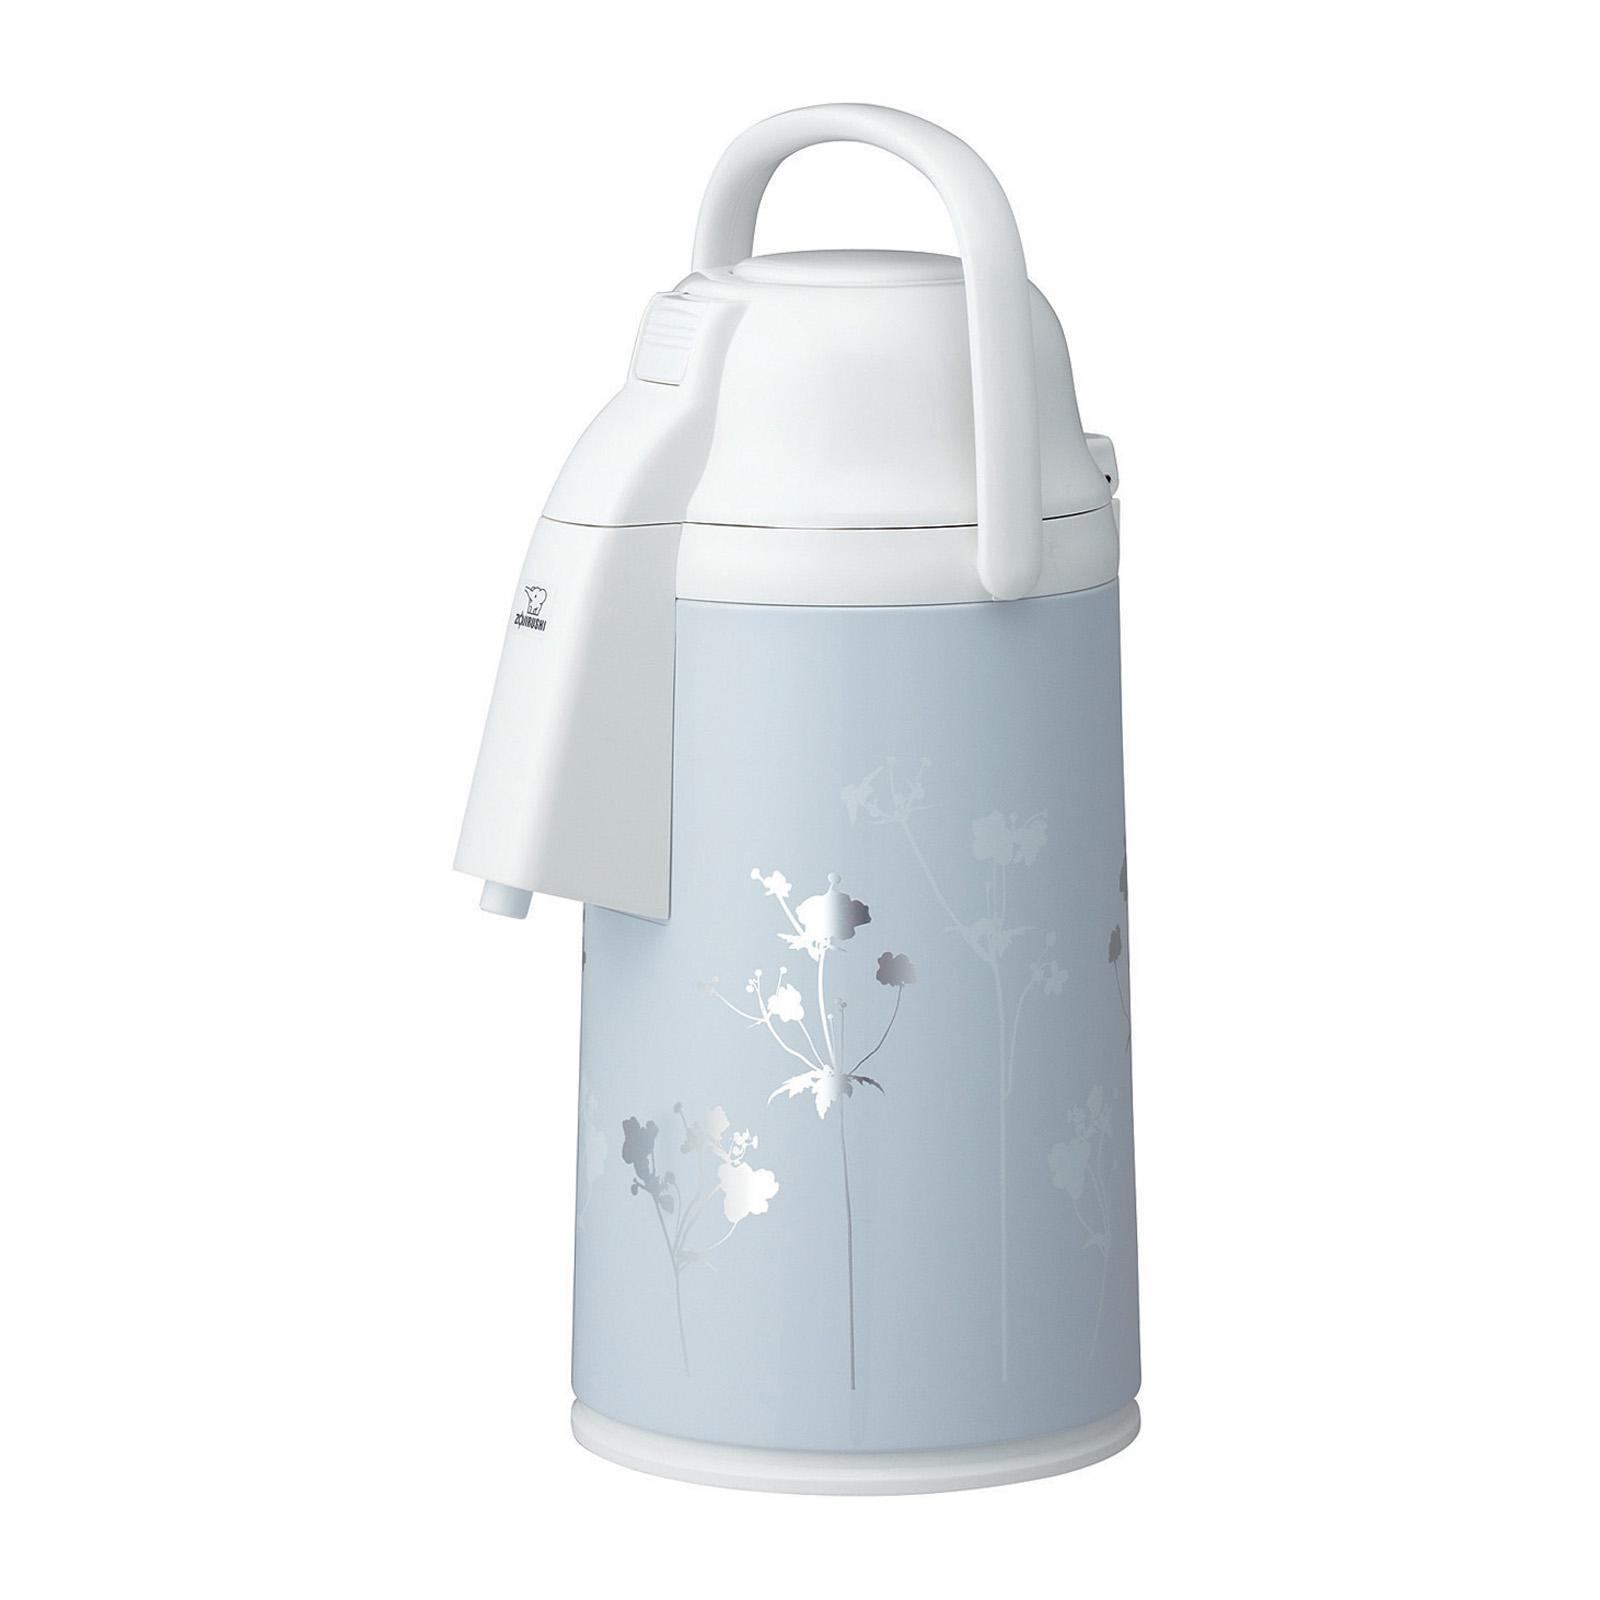 Zojirushi Airpot (Mint Gray) - Thermos 3L